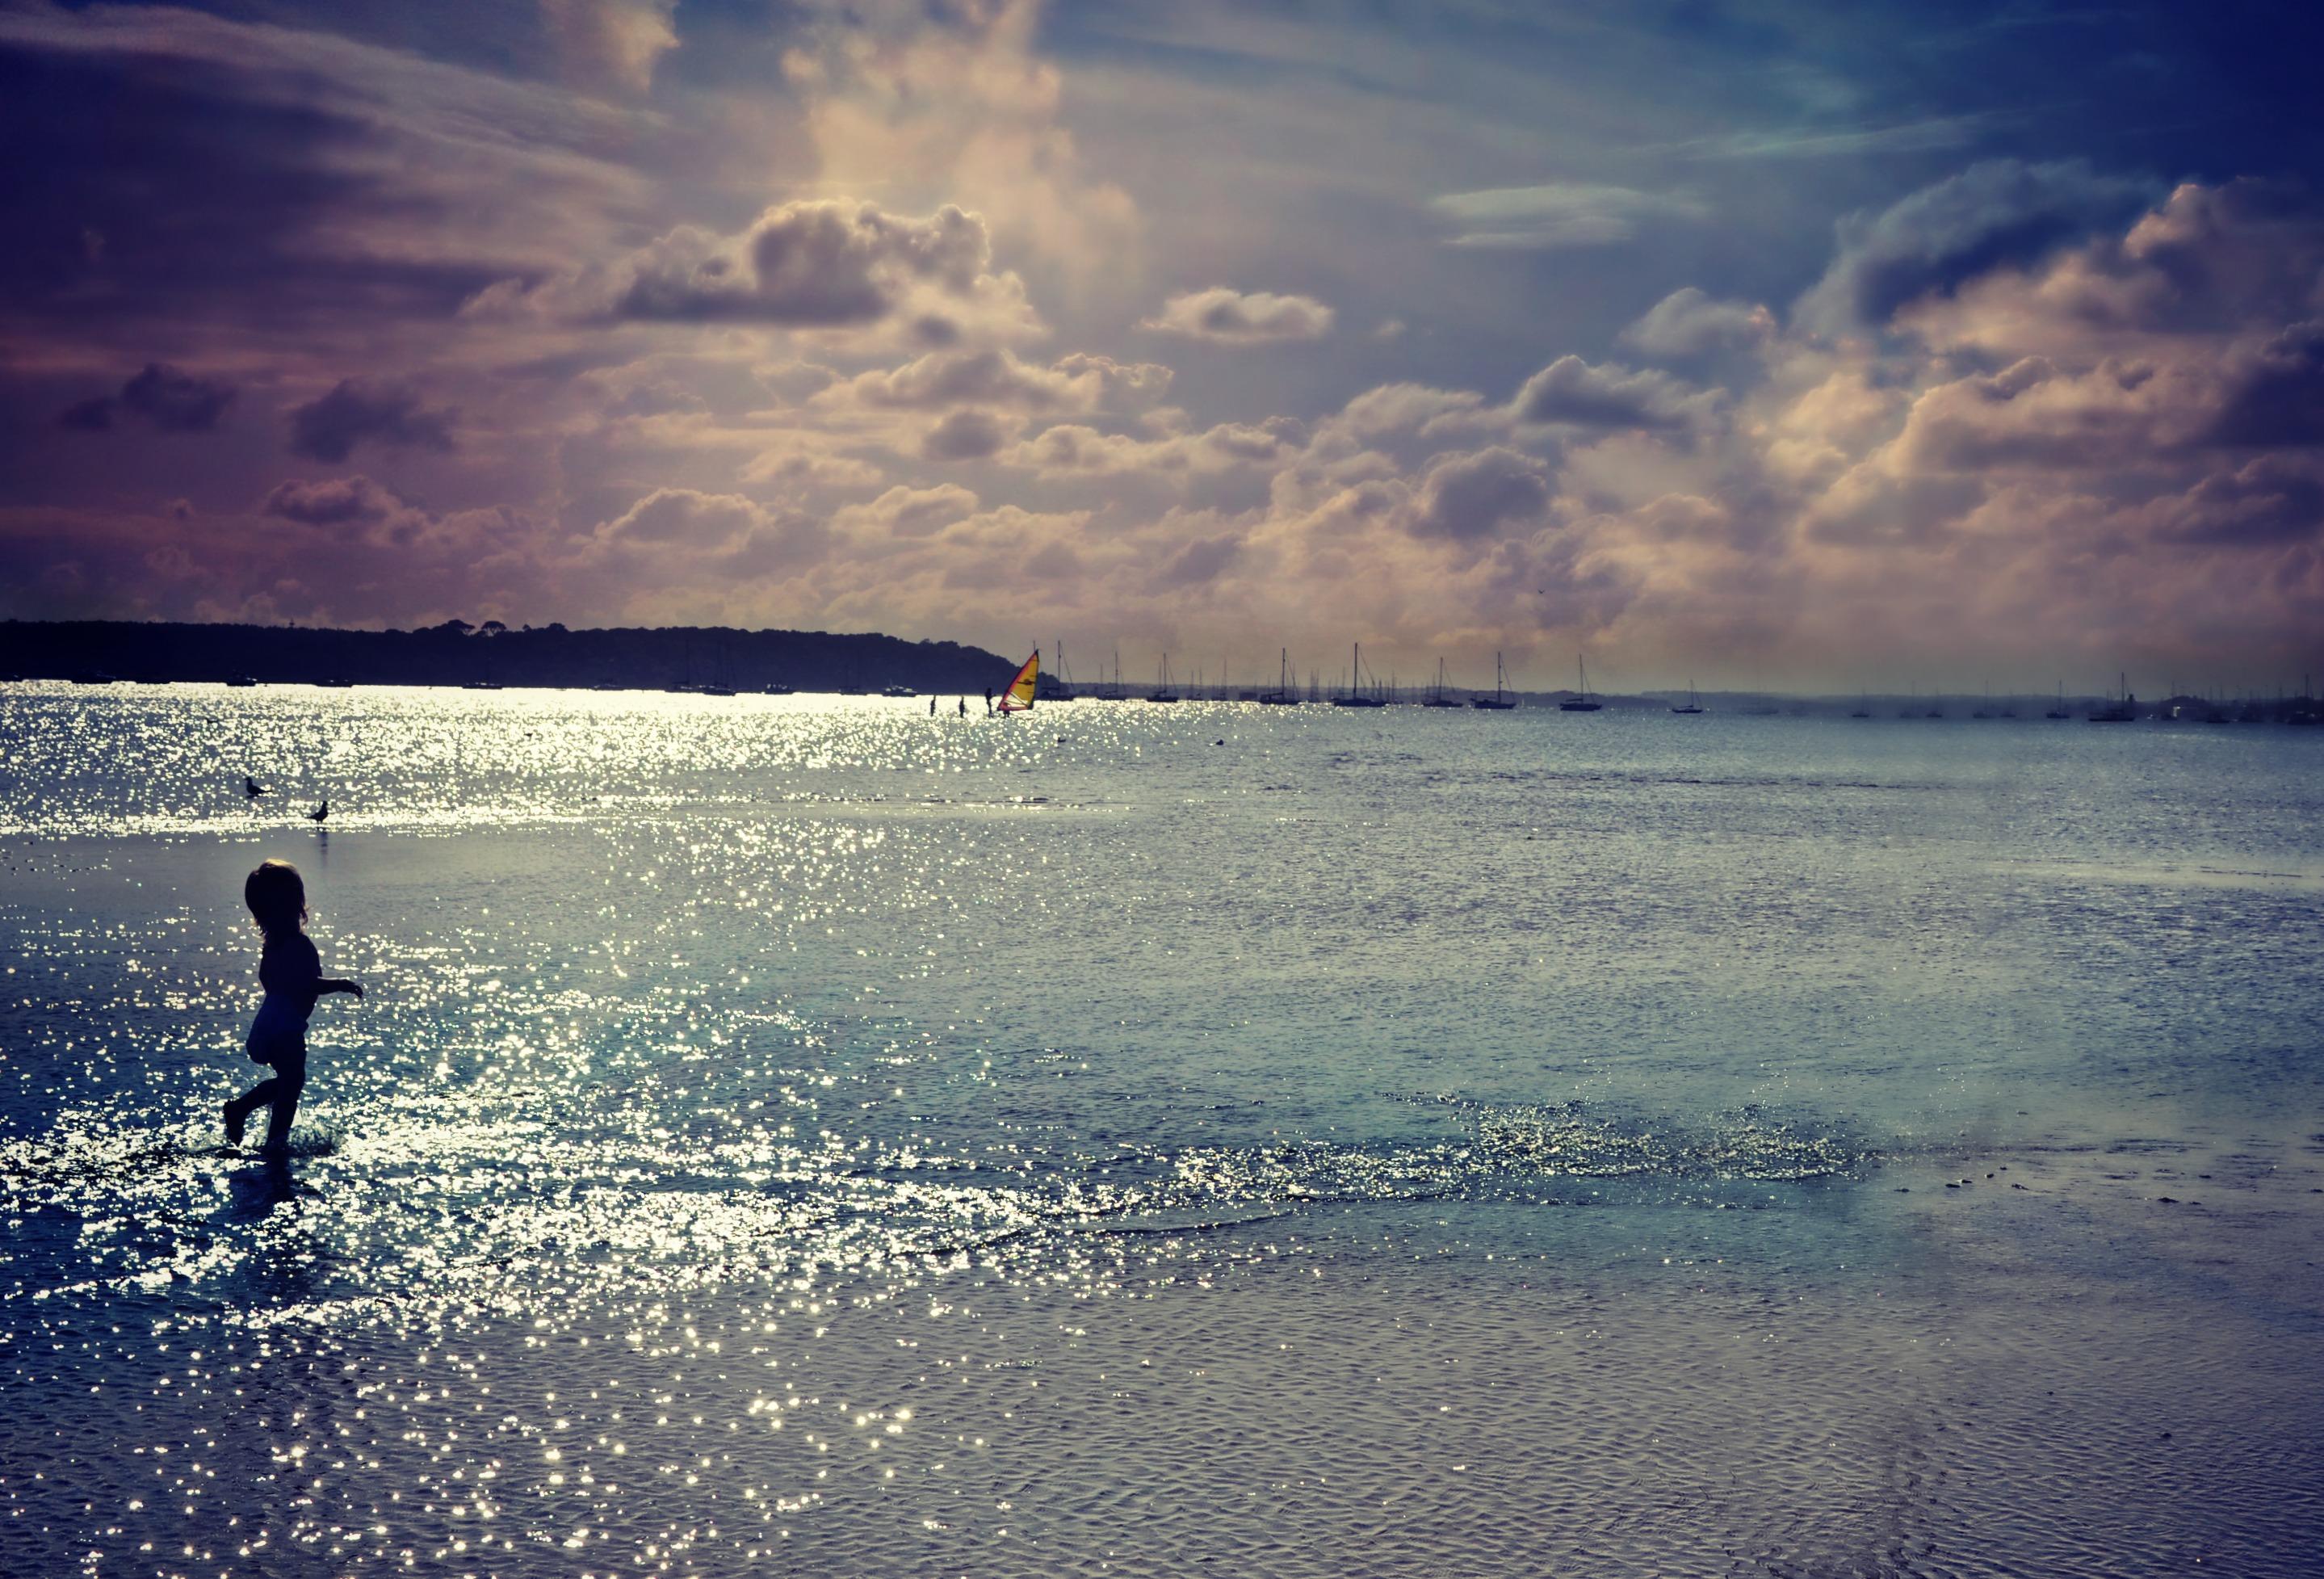 seaside photo session